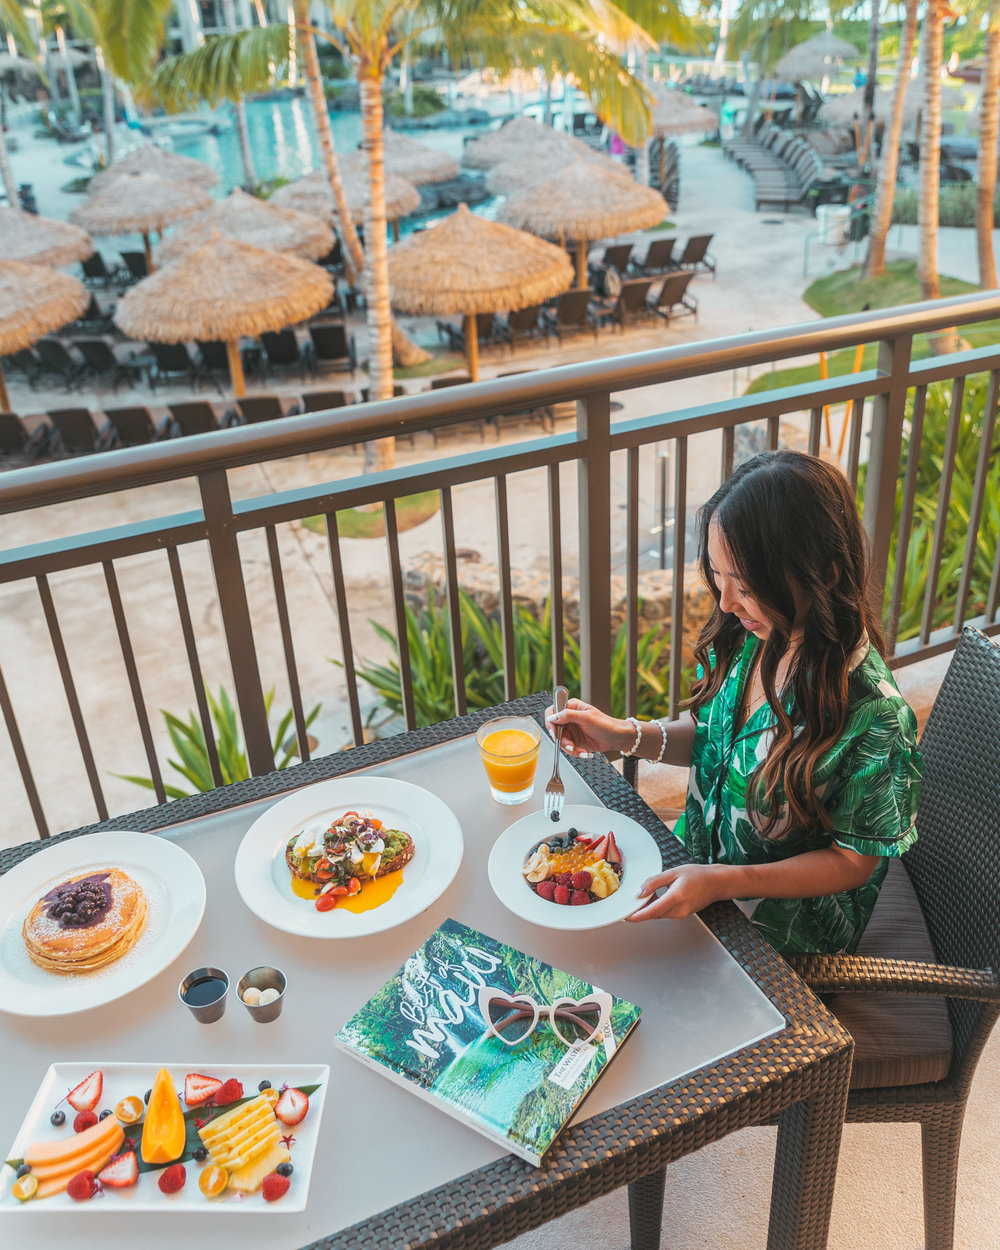 Balcony breakfast at Westin Nanea // The Quick Guide to Visiting Maui, Hawaii #readysetjetset #hawaii #maui